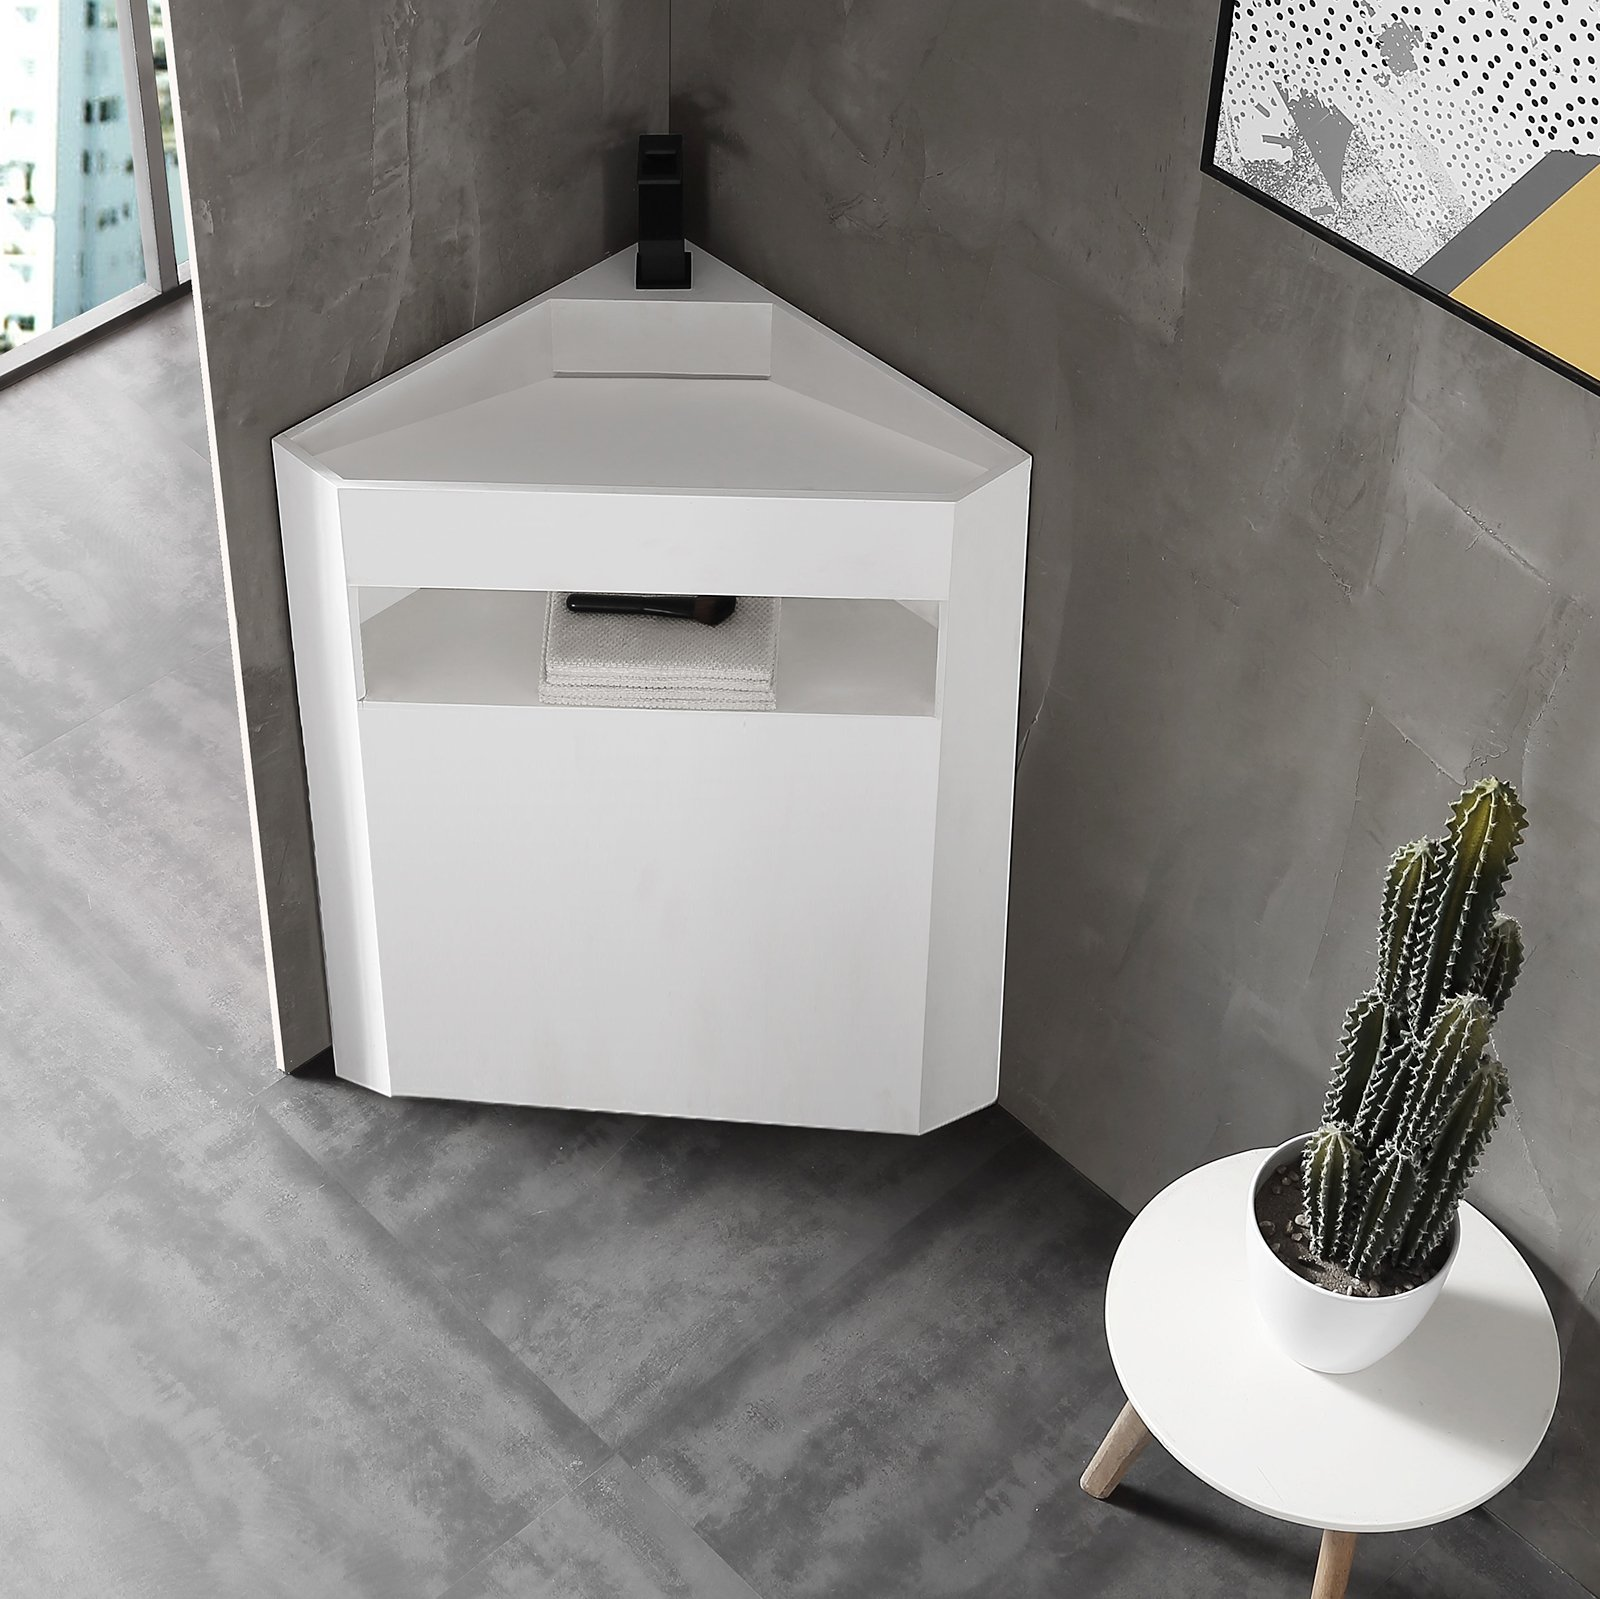 Standwaschbecken aus Mineralguss TWZ70 - Eckwaschbecken Weiß matt - 50 x 50 x 90 cm